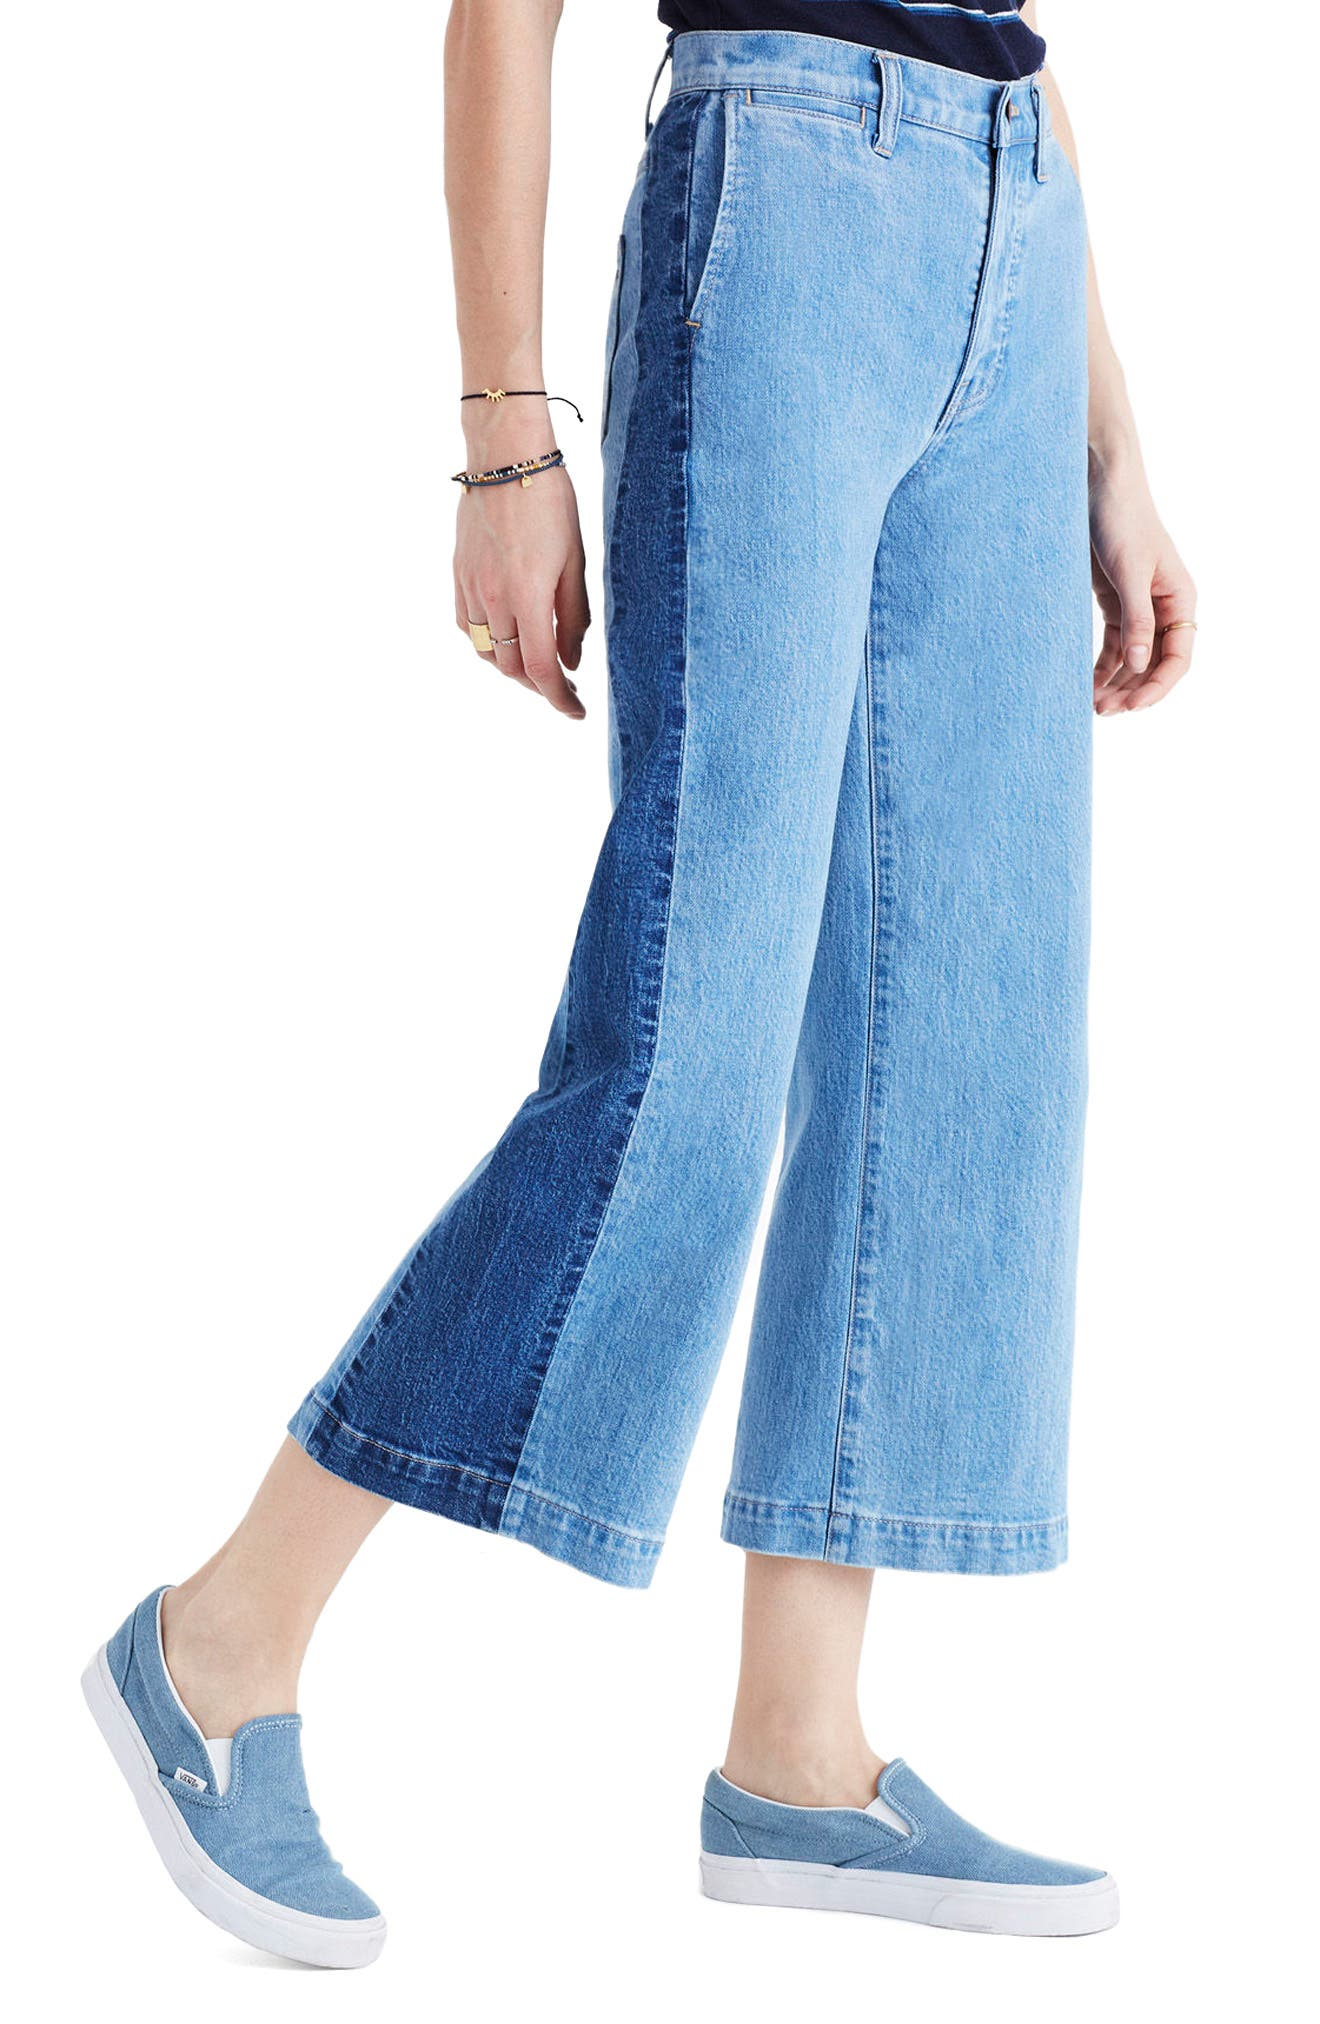 Alternate Image 1 Selected - Madewell High Waist Crop Wide Leg Jeans (Ellendale Wash)